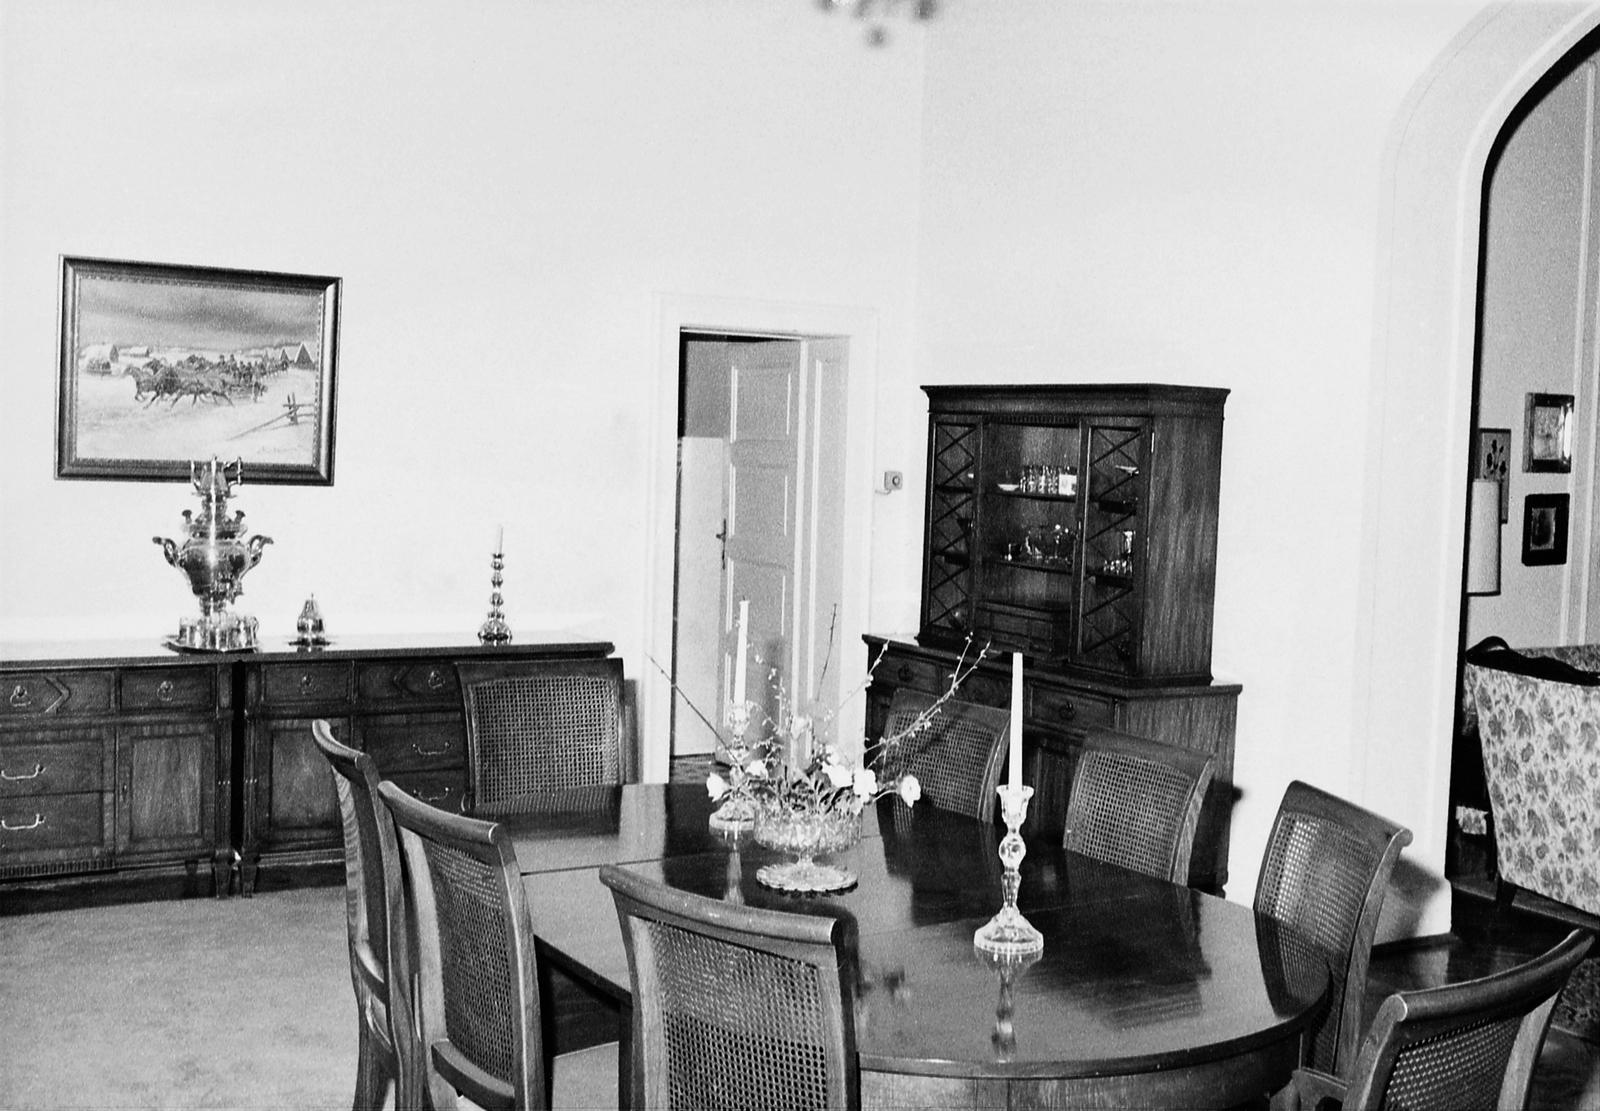 Belgrade - Department of Defense Agency Head Residence - 1979